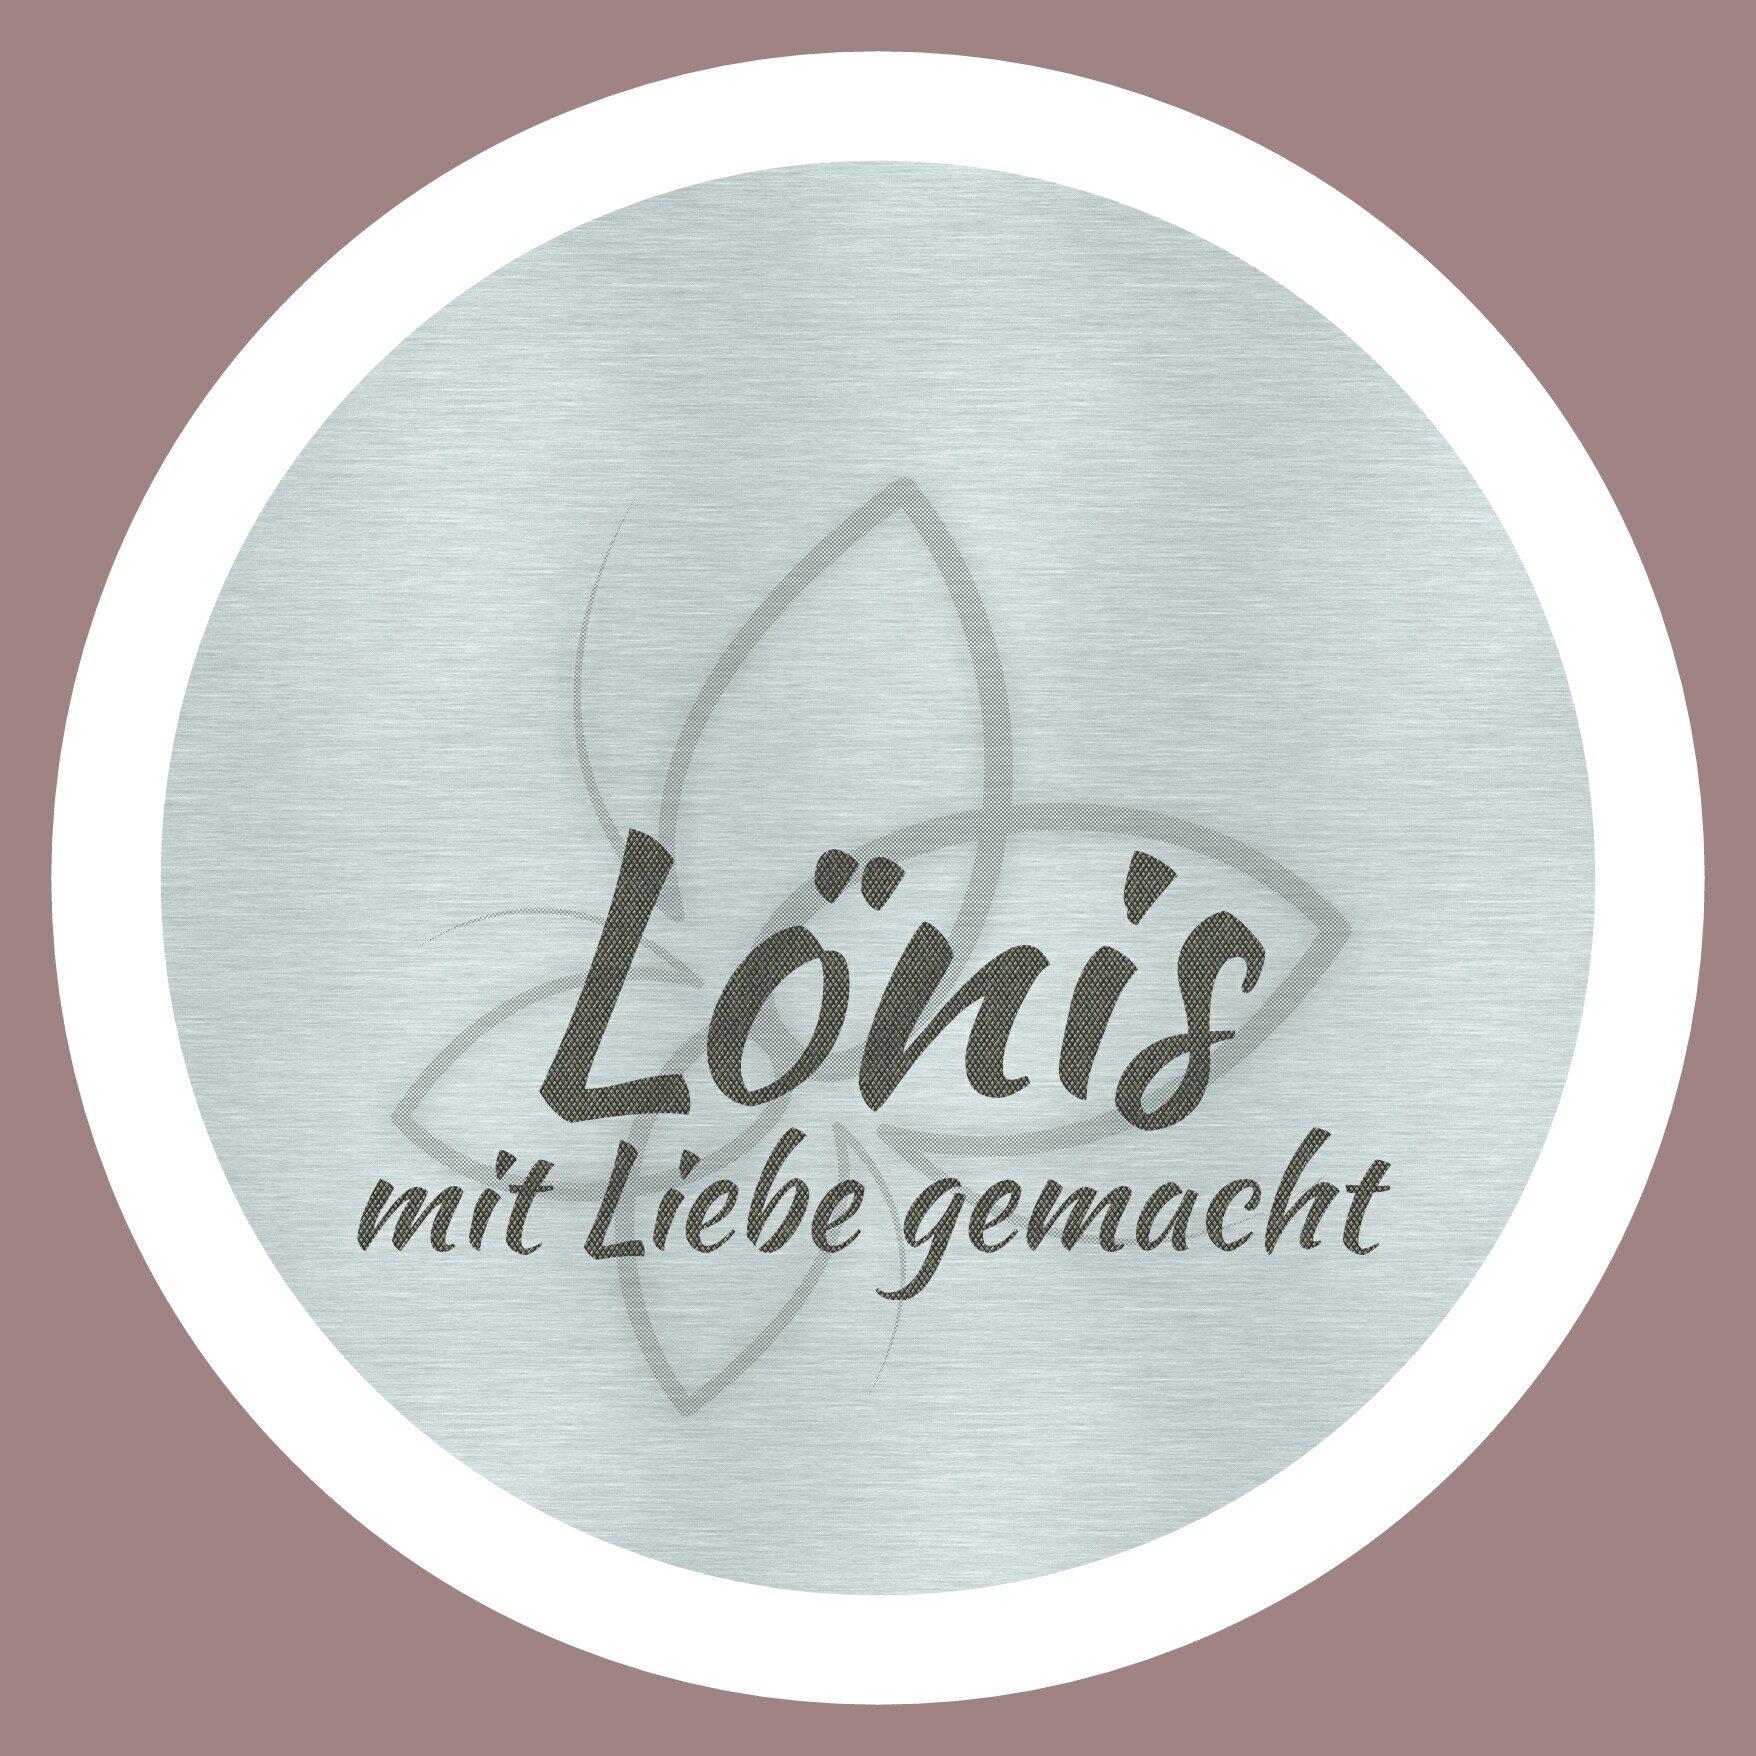 Lönis